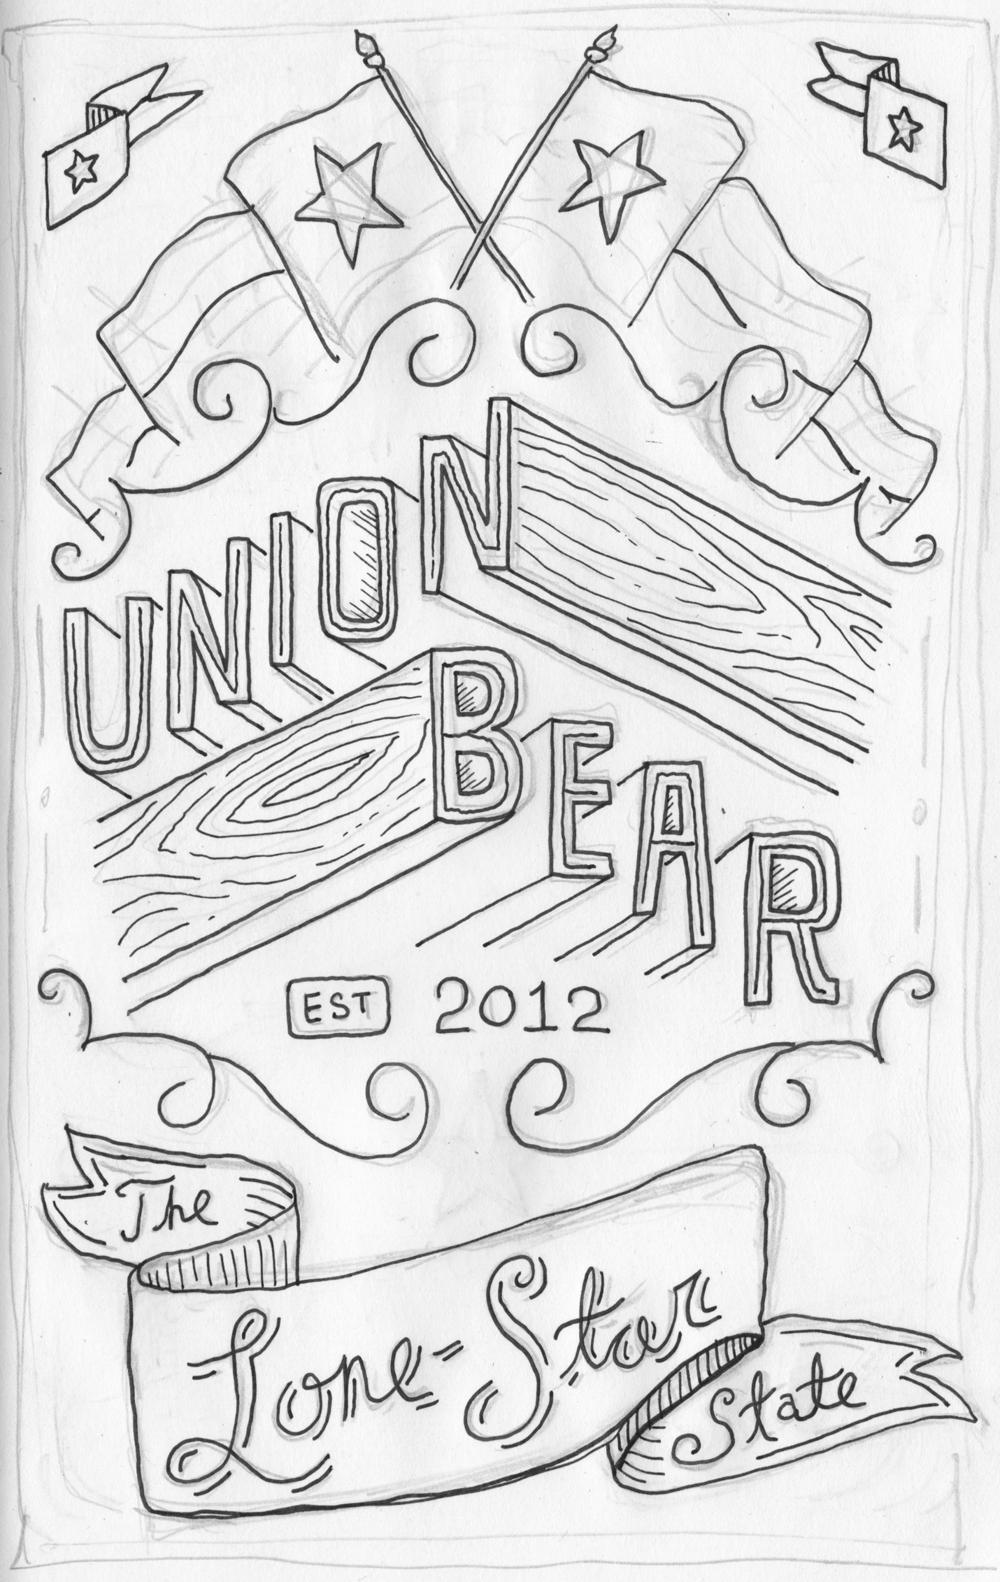 ub-sketch.jpg